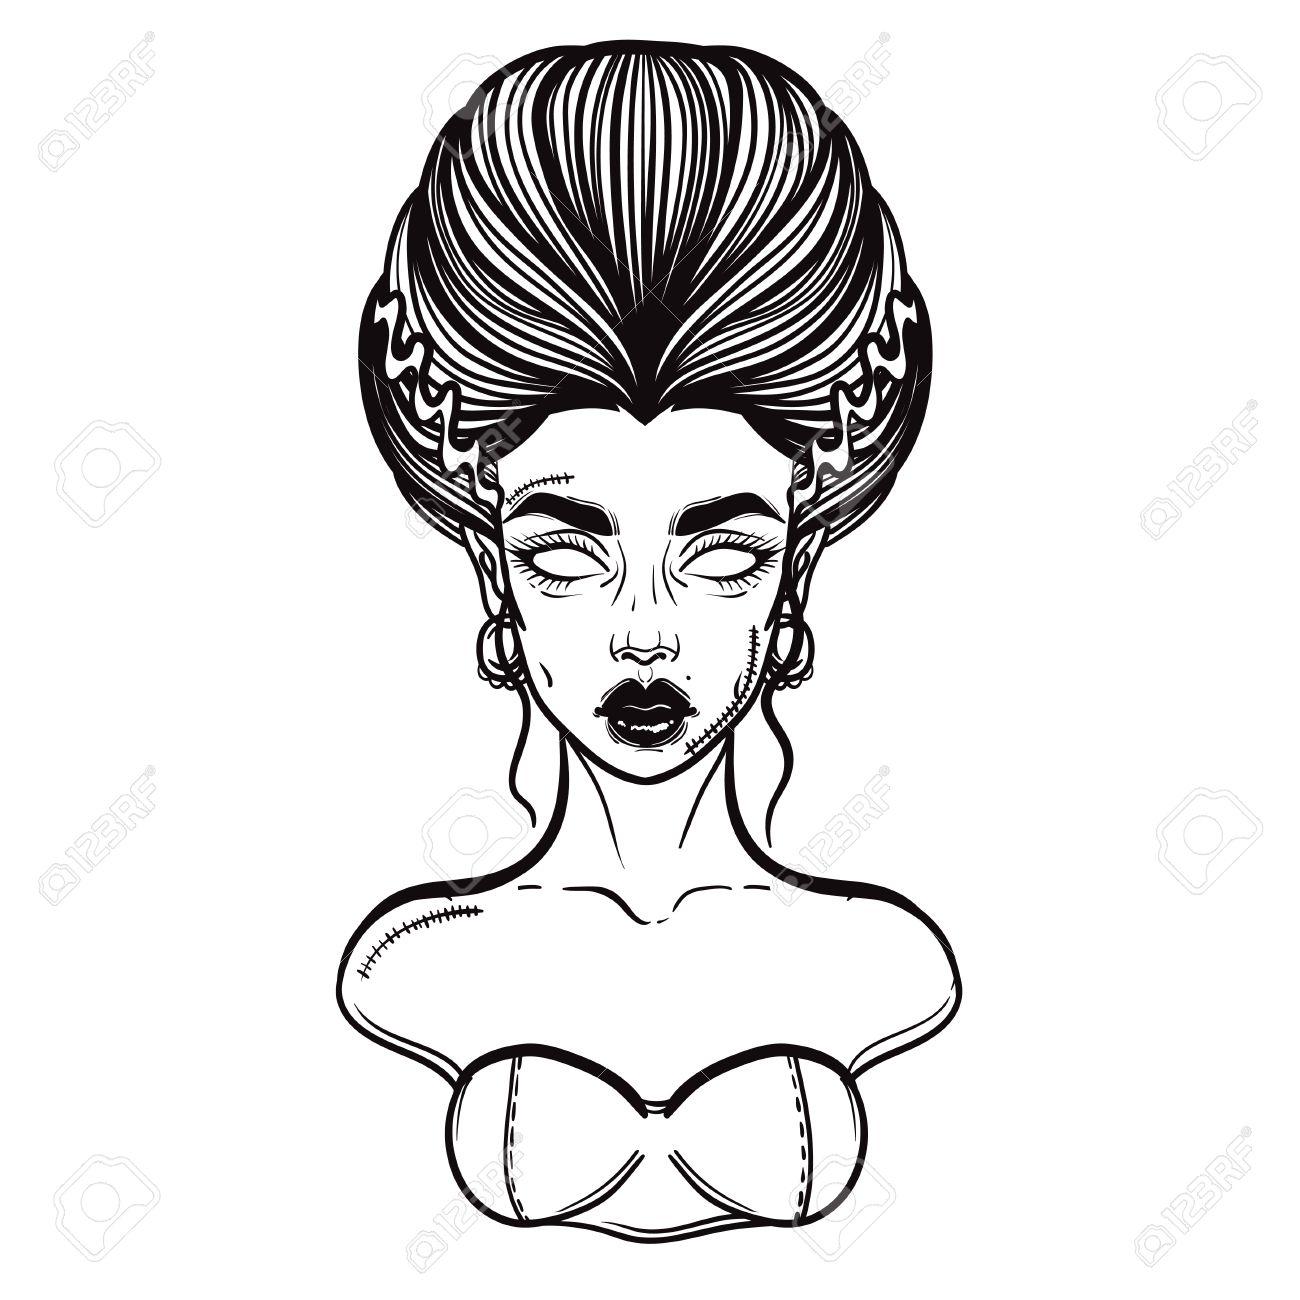 1300x1300 The Bride Of Frankenstein Girl Line Art. Hand Drawn Vector